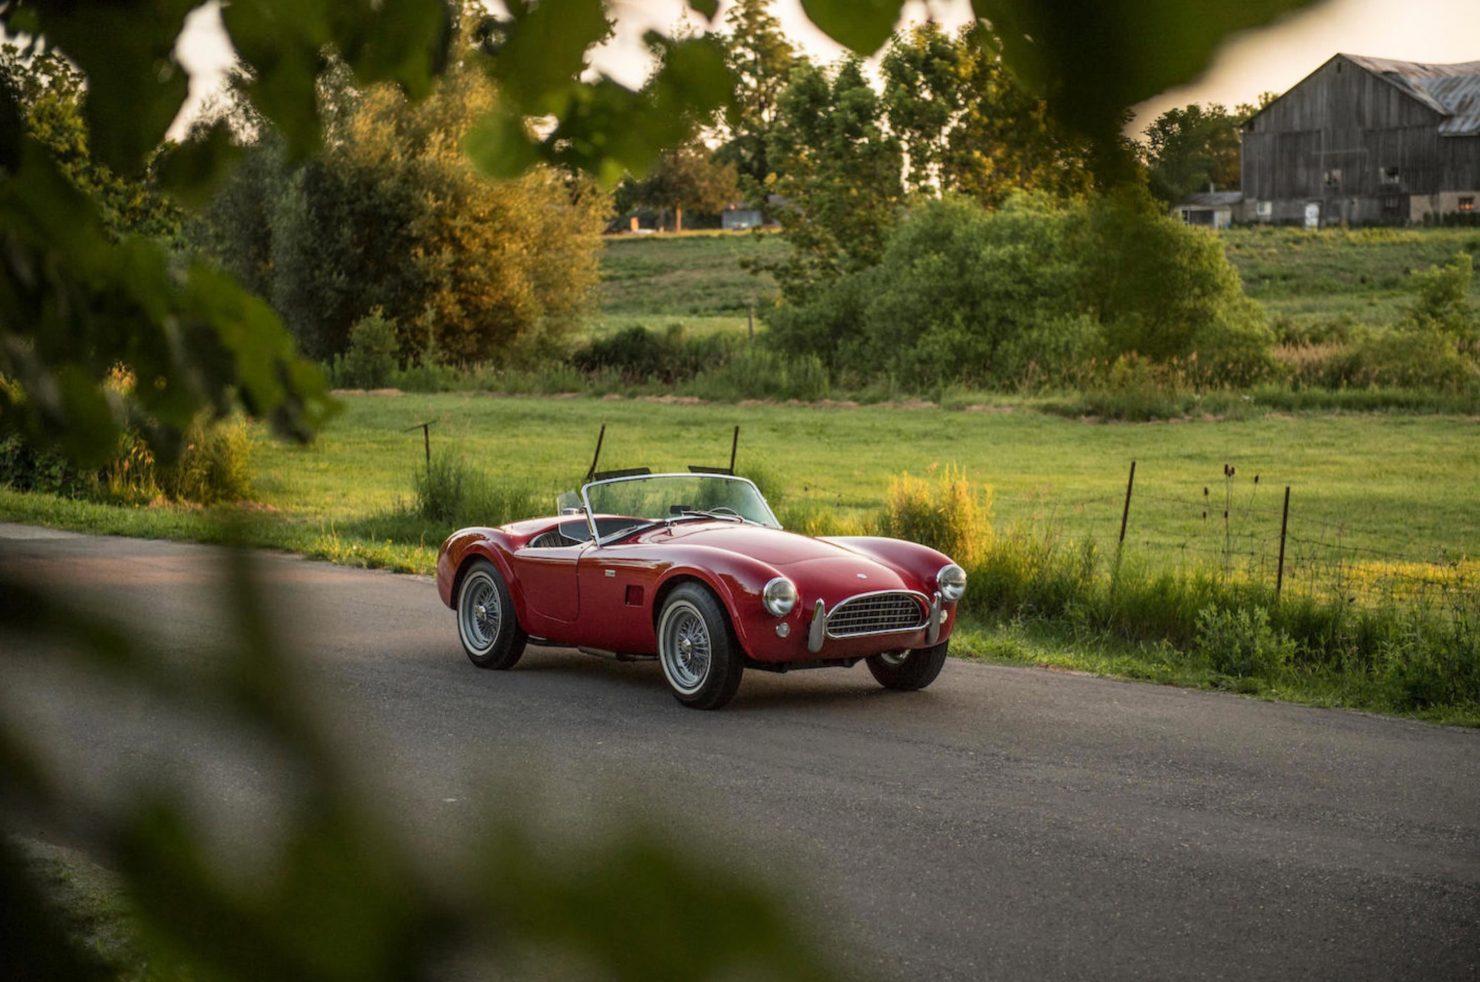 shelby ac cobra 289 36 1480x982 - 1964 Shelby AC Cobra 289